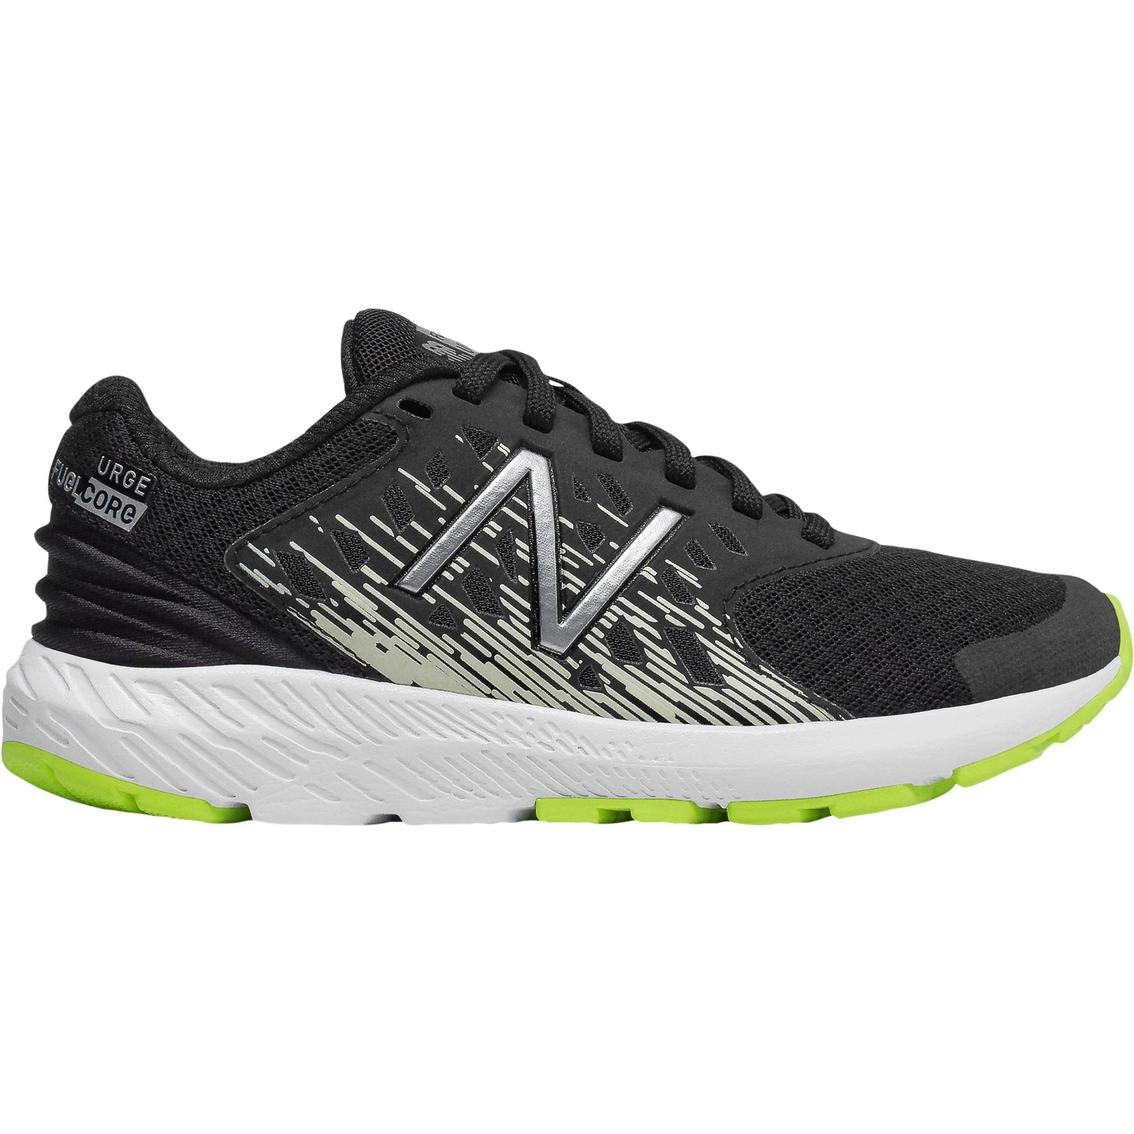 96acd662e7b72 New Balance Grade School Boys Kjurgngy Fuelcore Urge Running Shoes ...